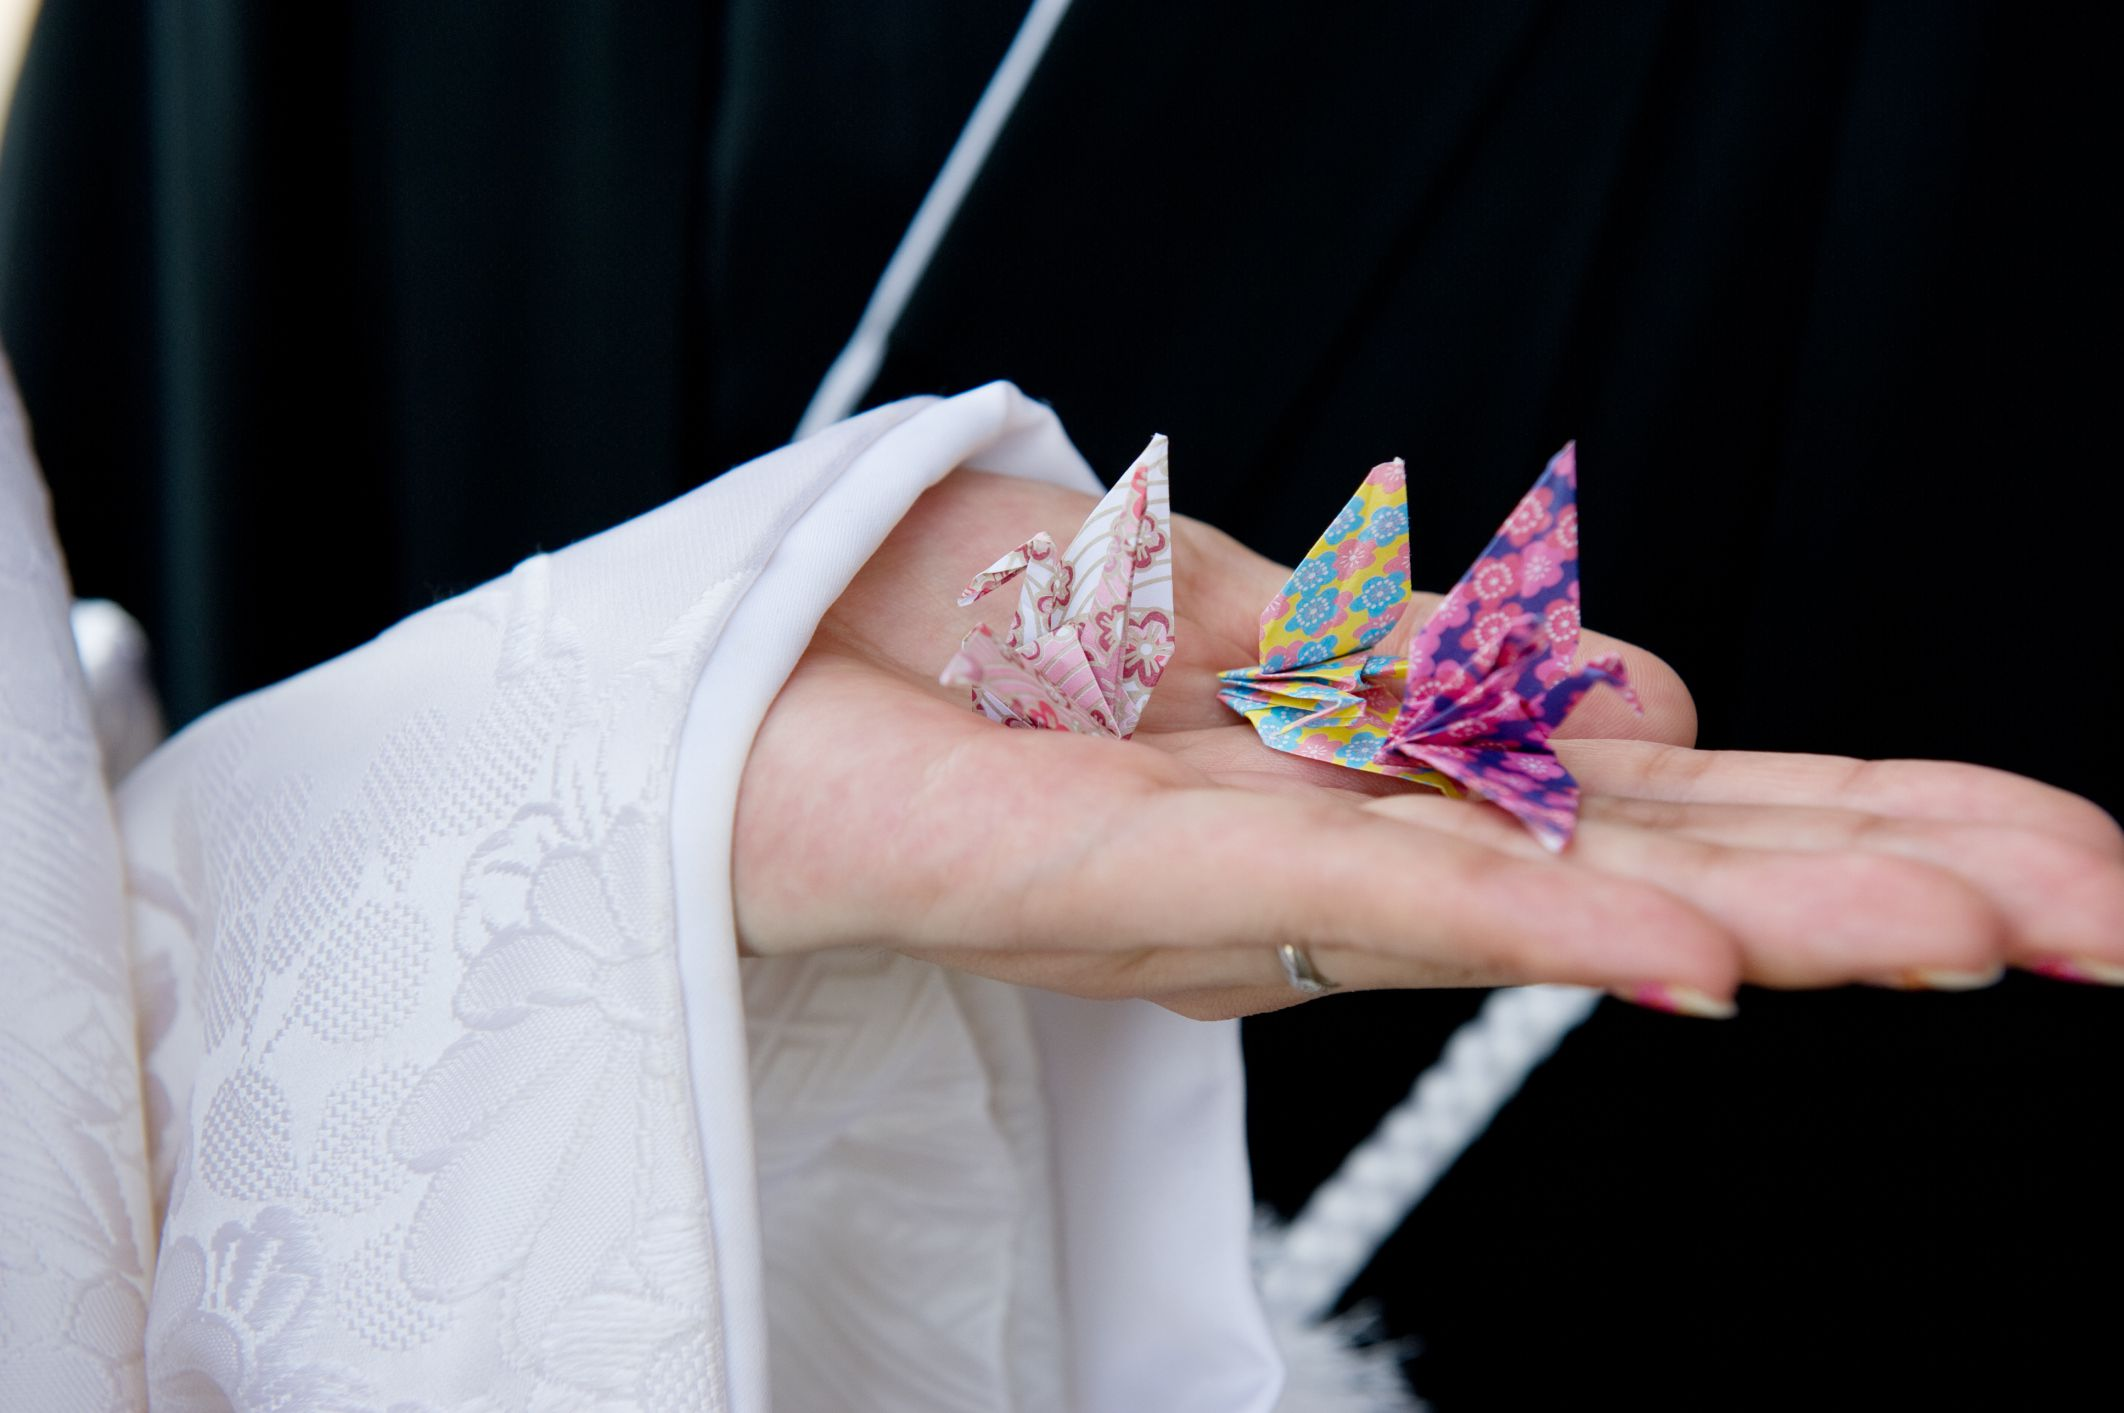 Origami Crane - How to Fold a Traditional Paper Crane | 1413x2124